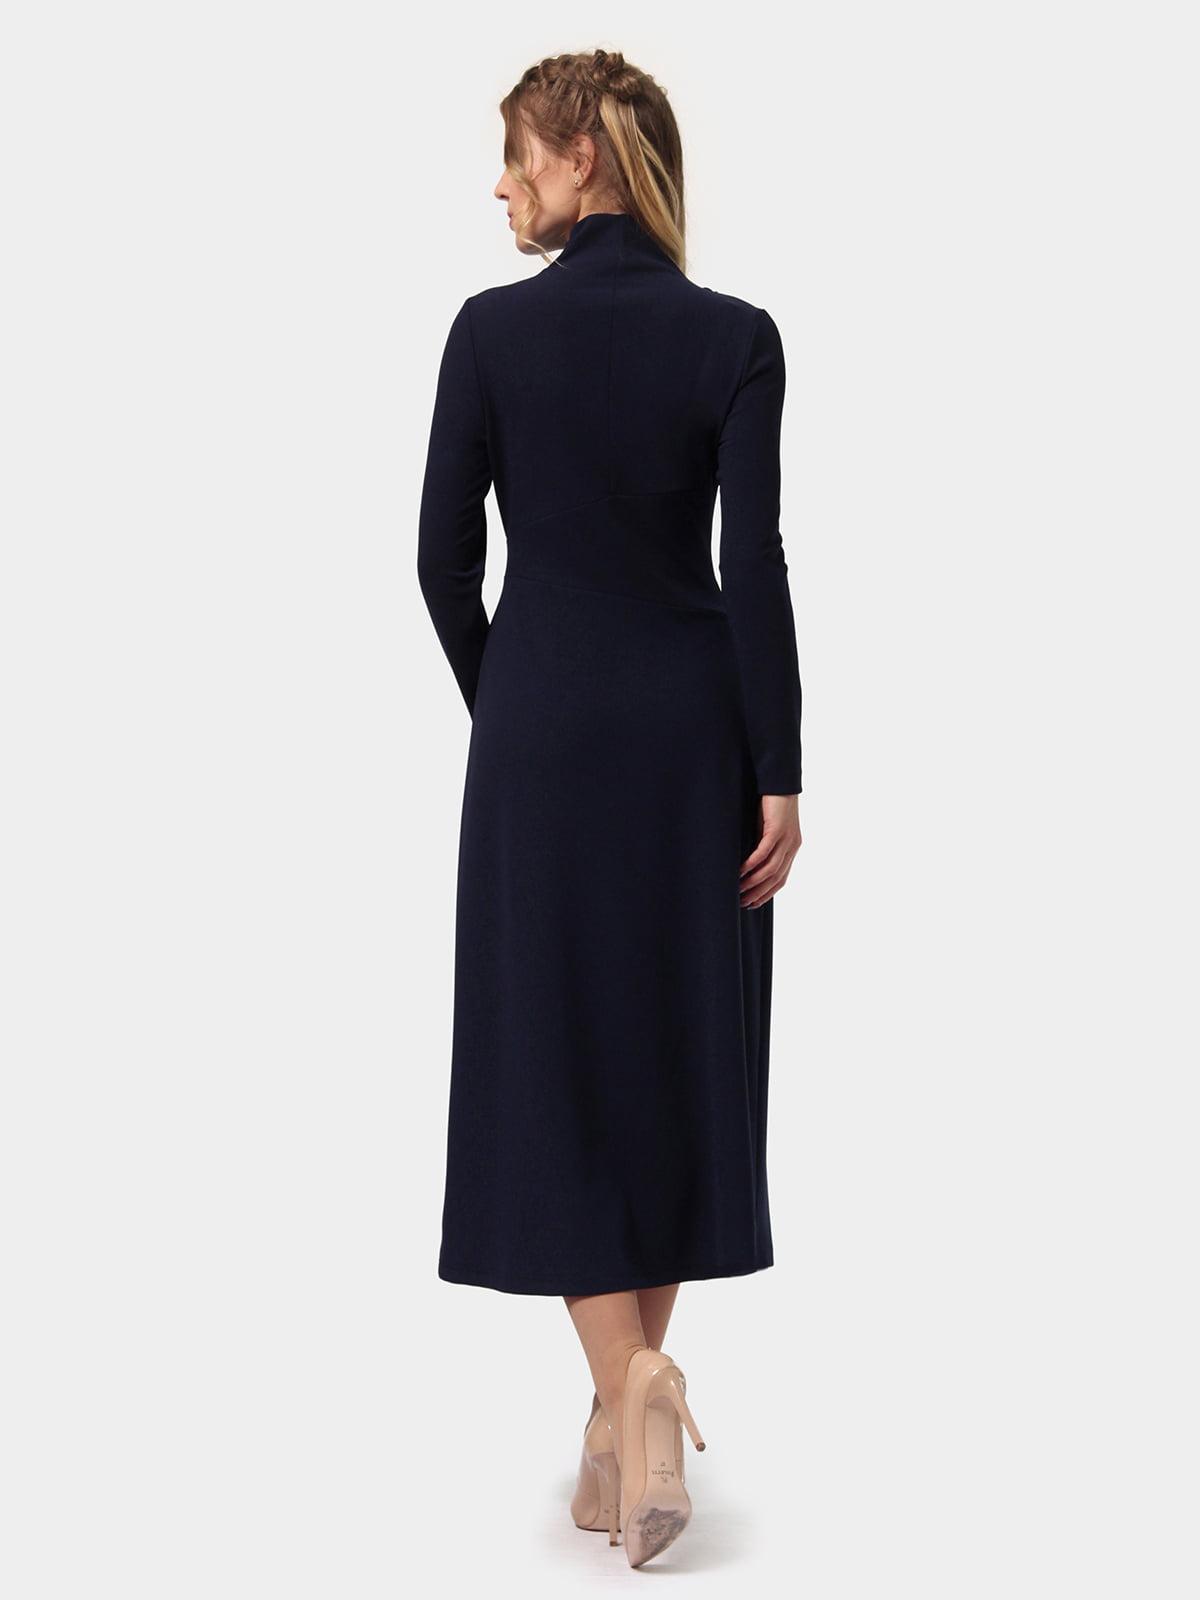 Платье темно-синее   4775706   фото 4